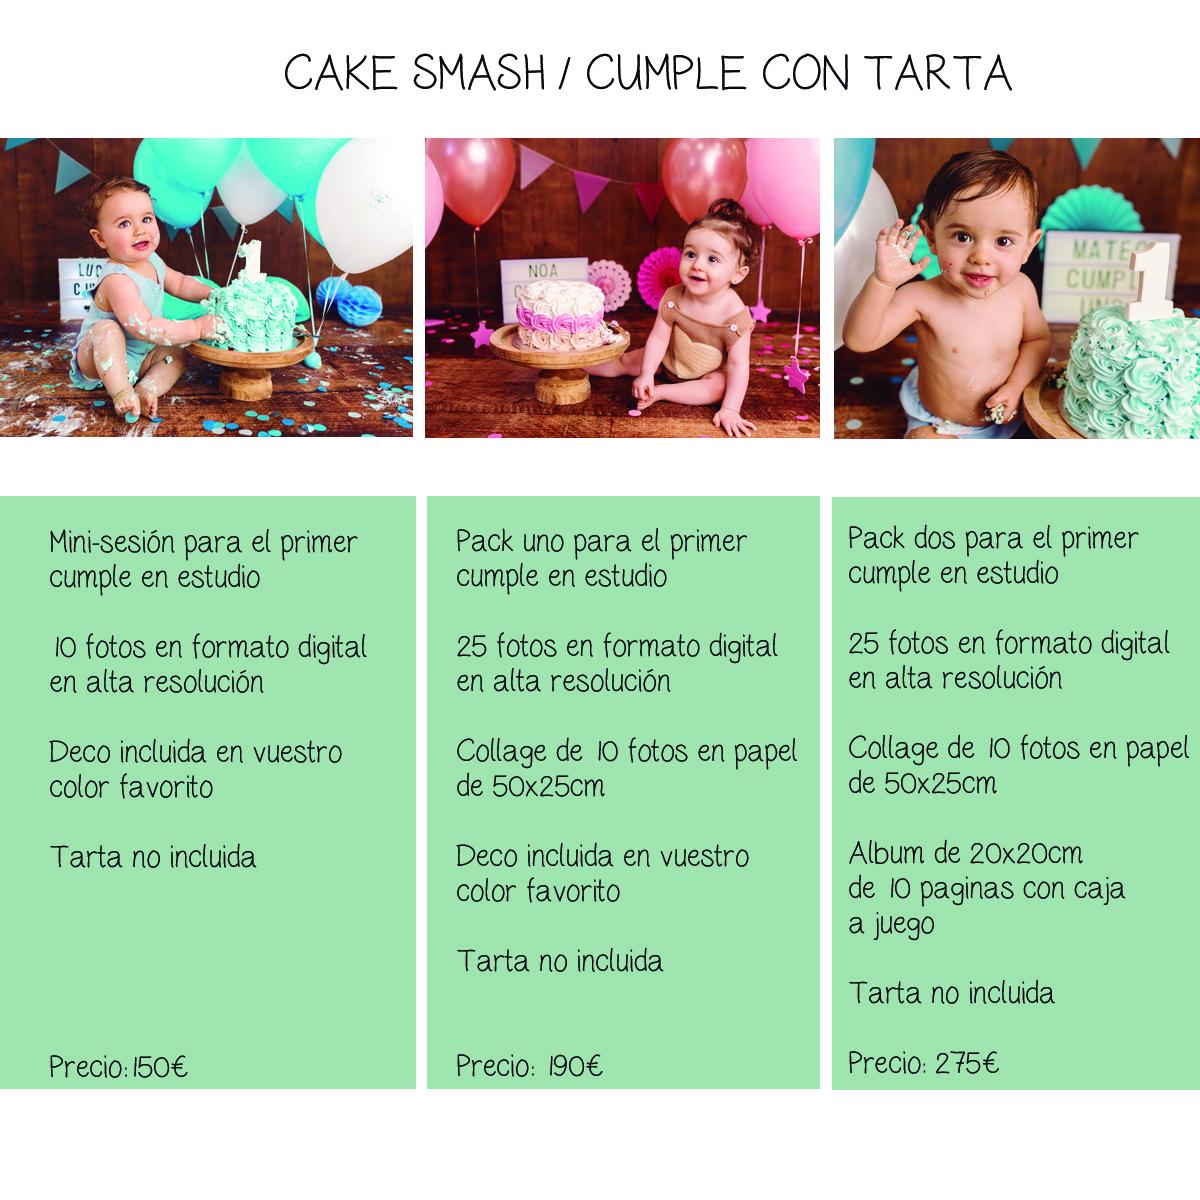 Tarifas cake smash Sara Gonzalez Fotografia